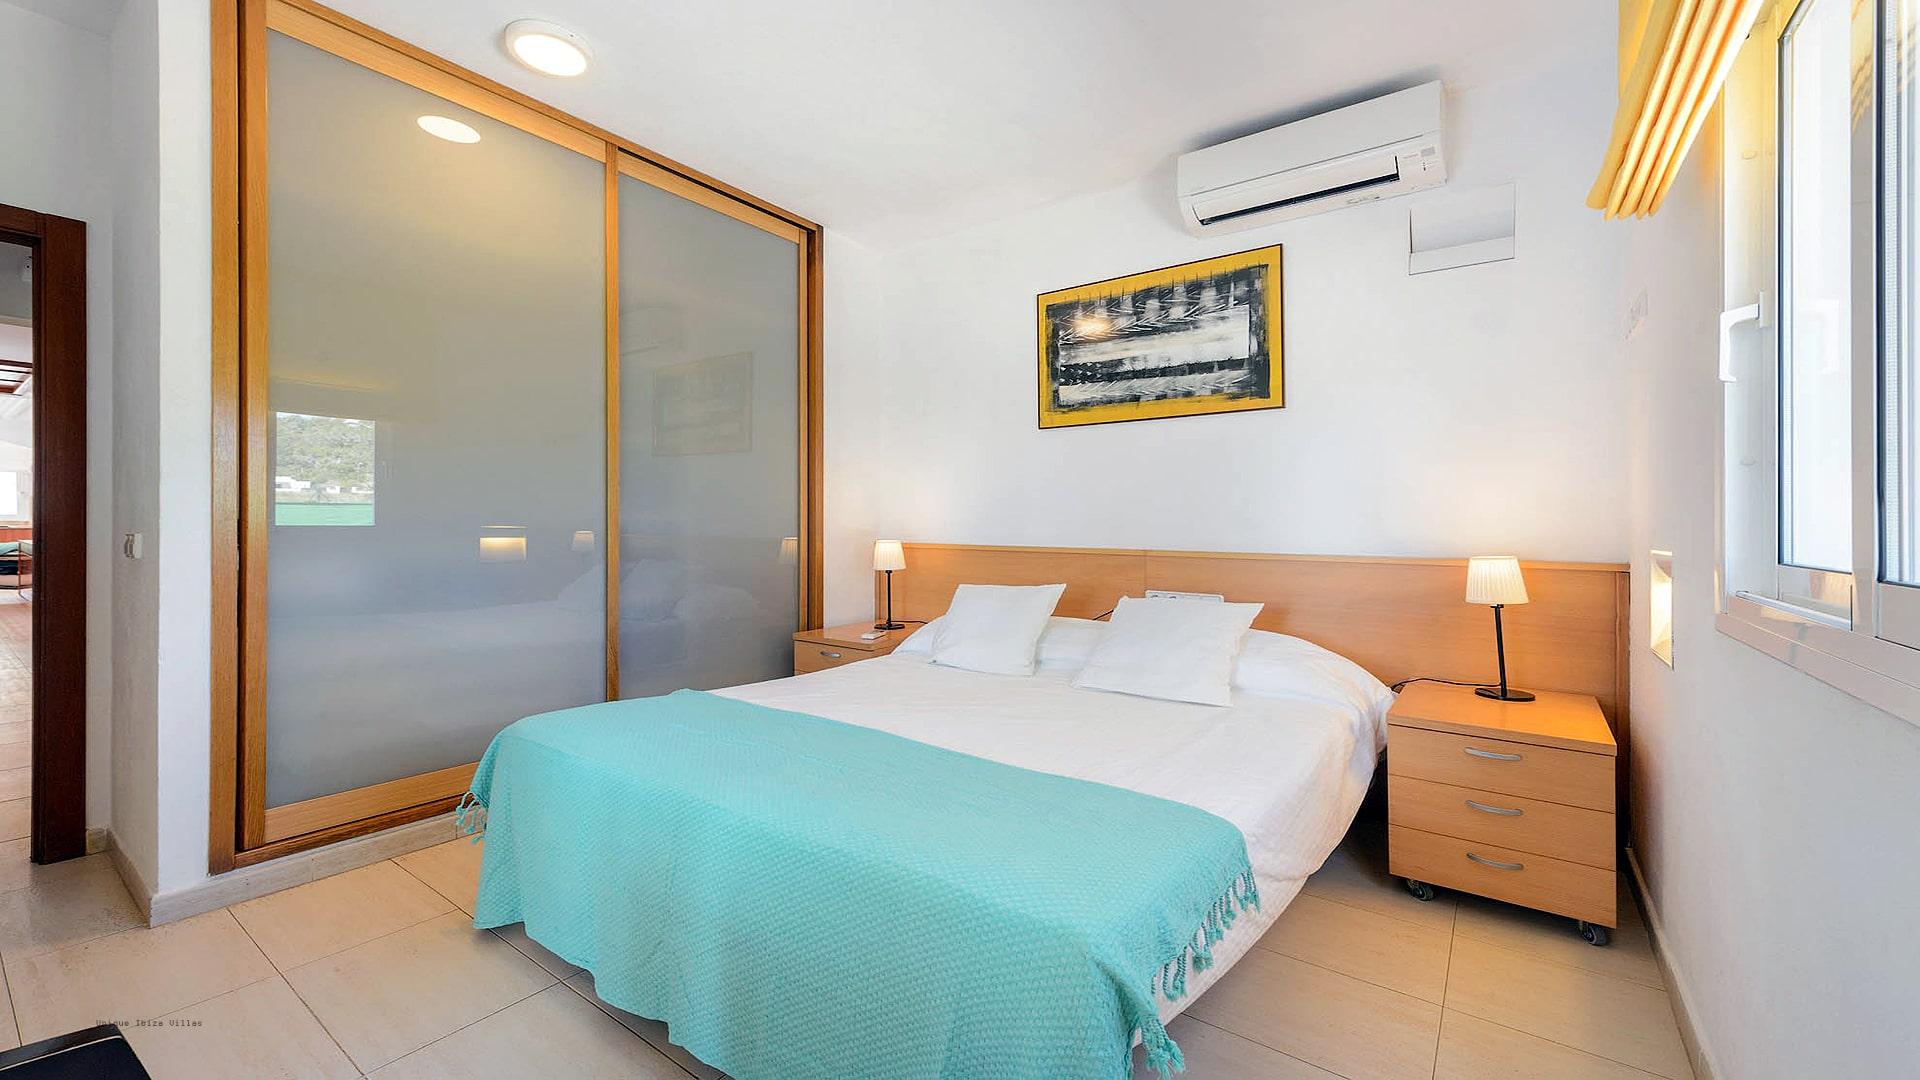 Villa Can Fluxa Ibiza 49 Bedroom 4